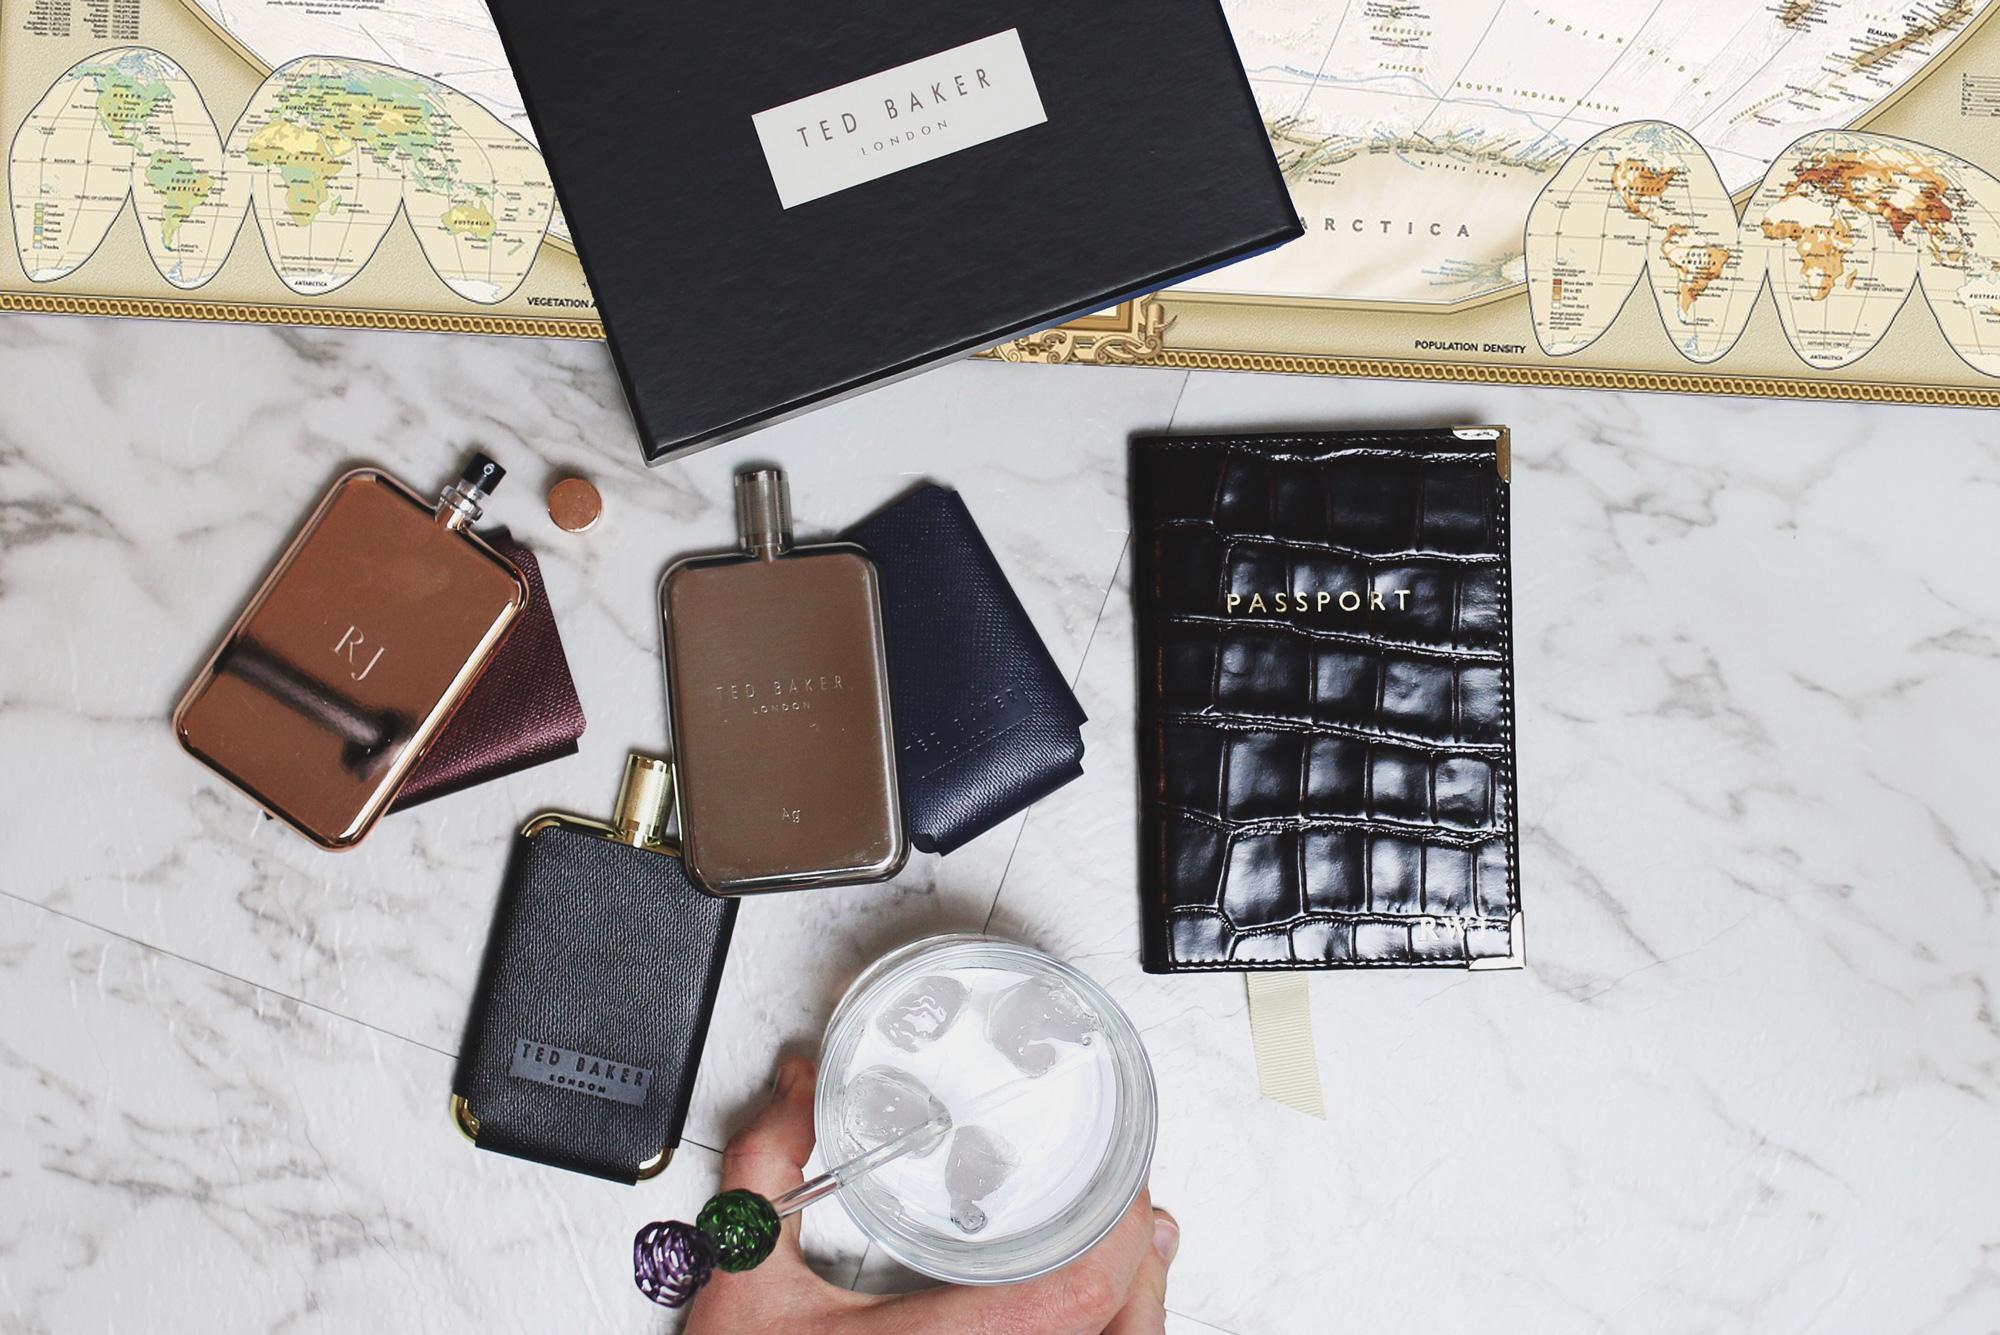 Ted-Baker-Travel-Tonics-Man-For-Himself-Map